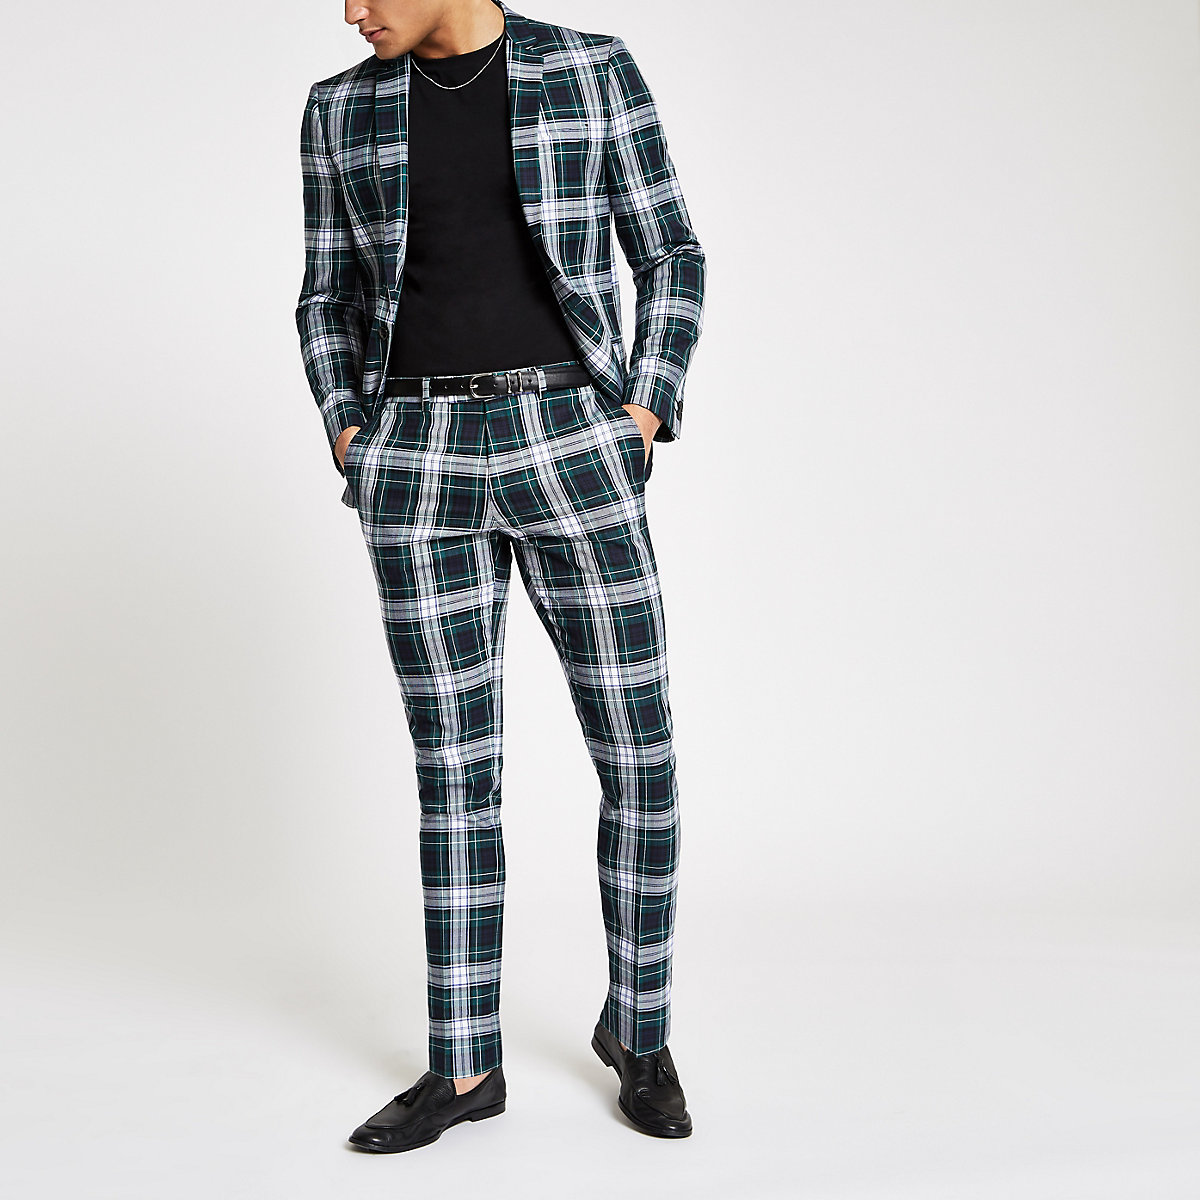 Green plaid skinny fit suit pants